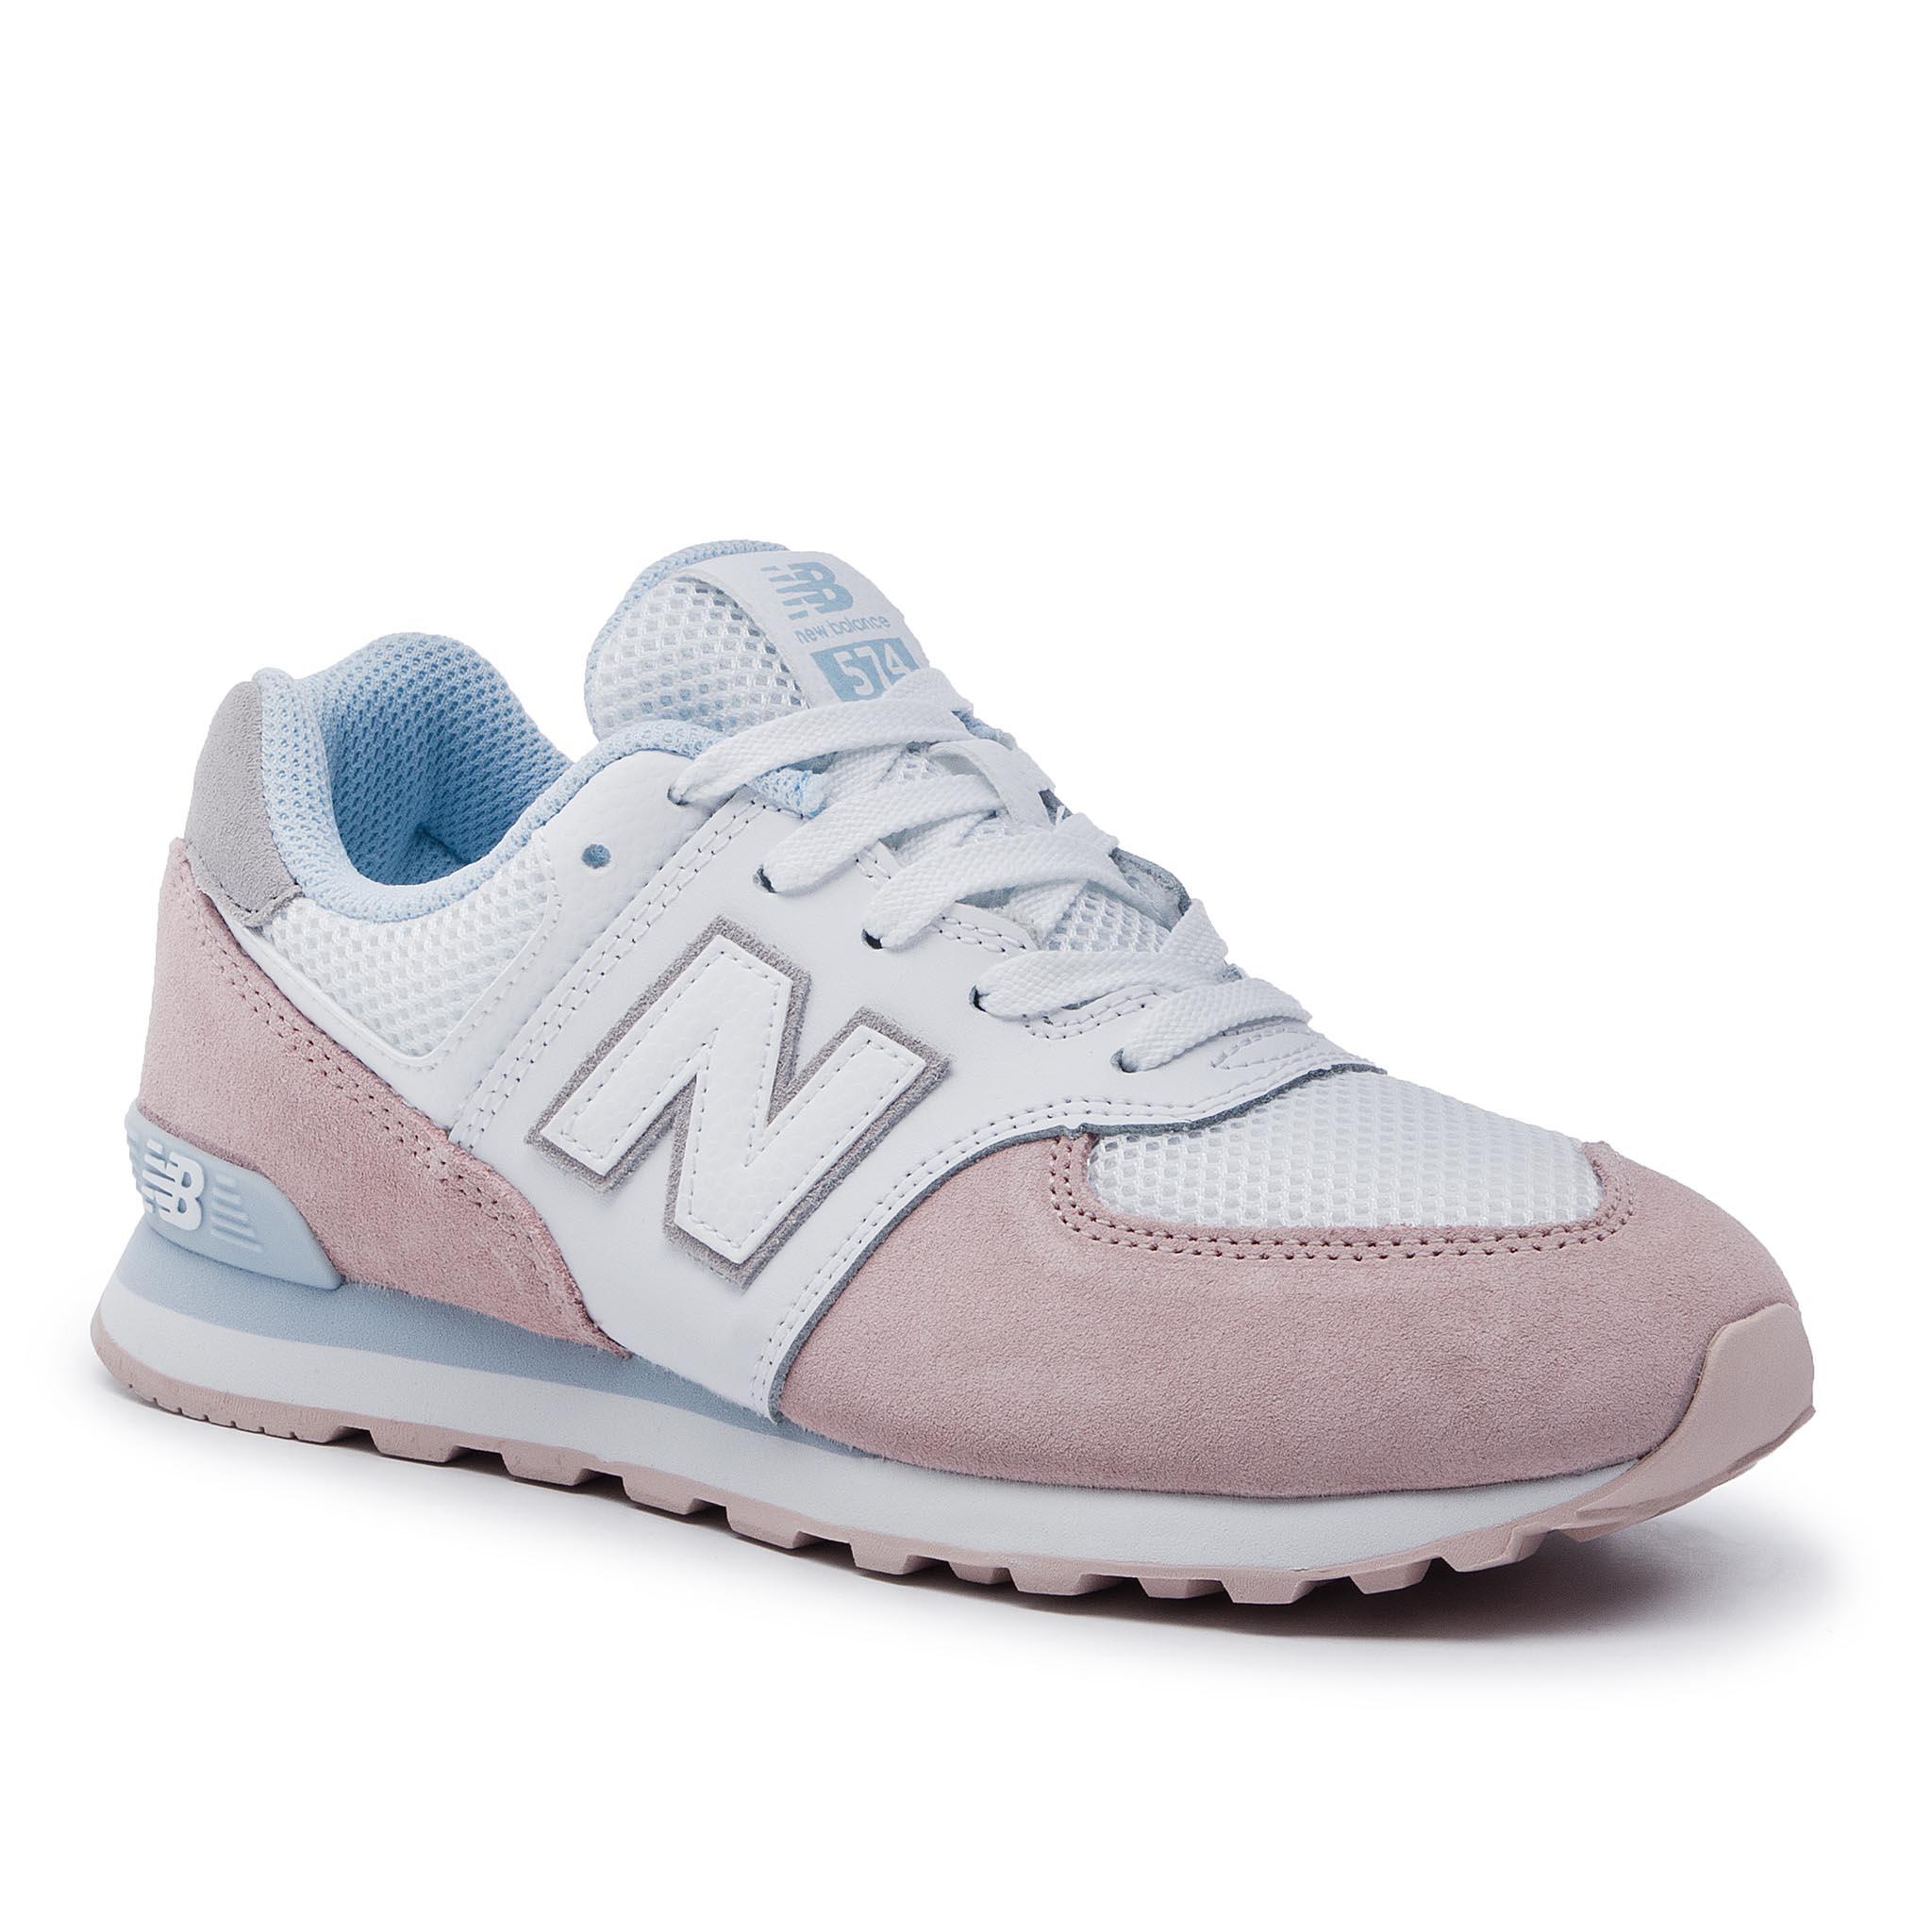 3d3e1c2e32f95 Sneakersy NEW BALANCE - GC574NSE Biela Ružová - Glami.sk